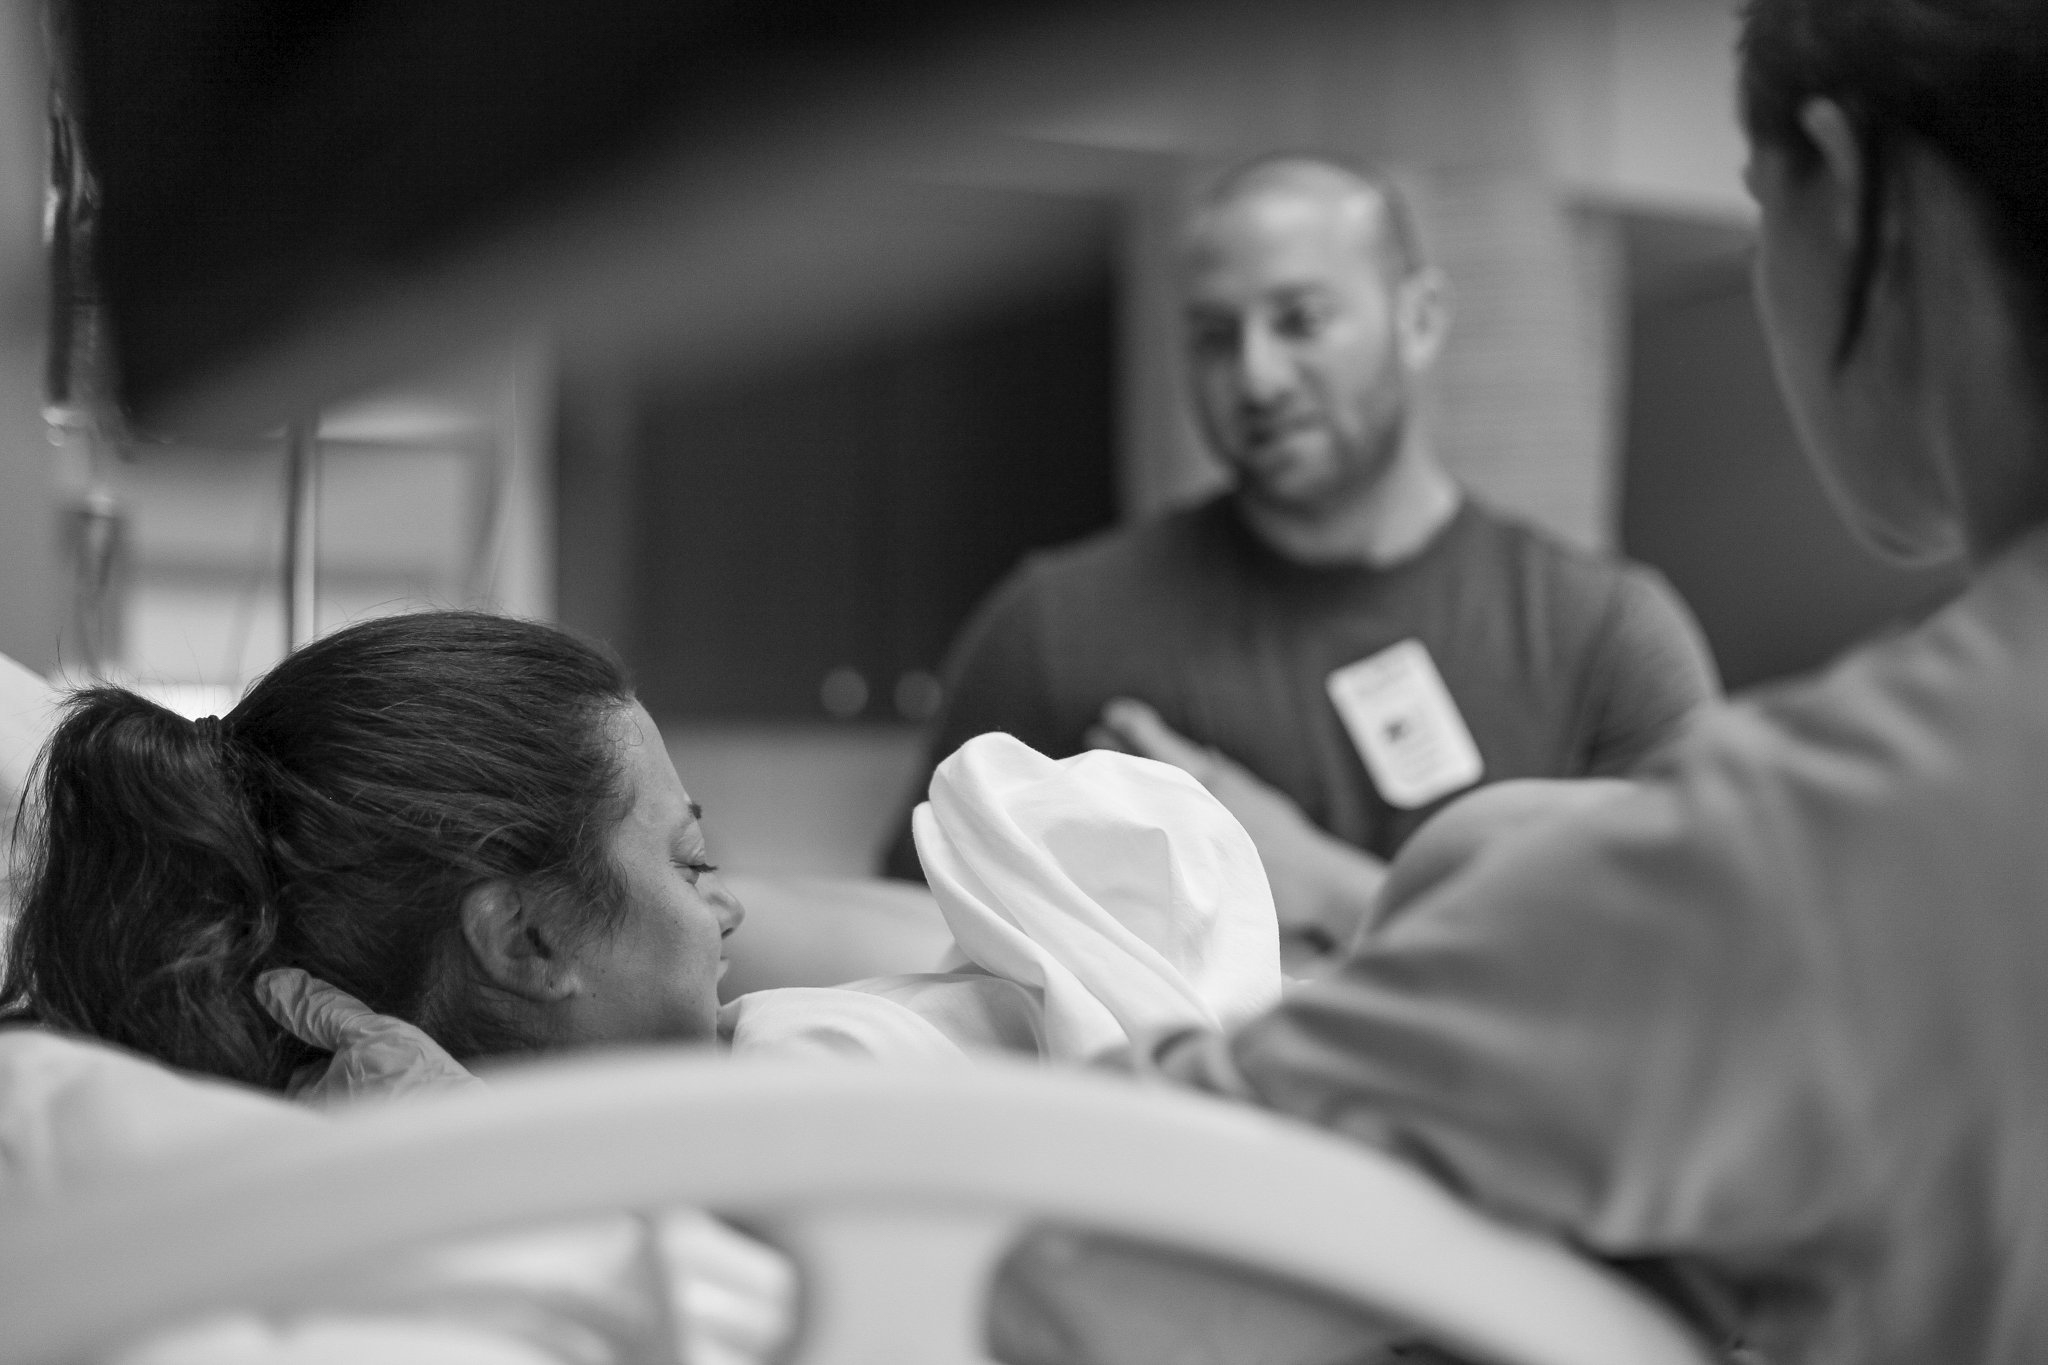 birth-center-hospital-photographer-photography-breastfeeding-south-florida-boca-regional-delray-palms-hollywood-pumping-water-natural-family-newborn-19.jpg